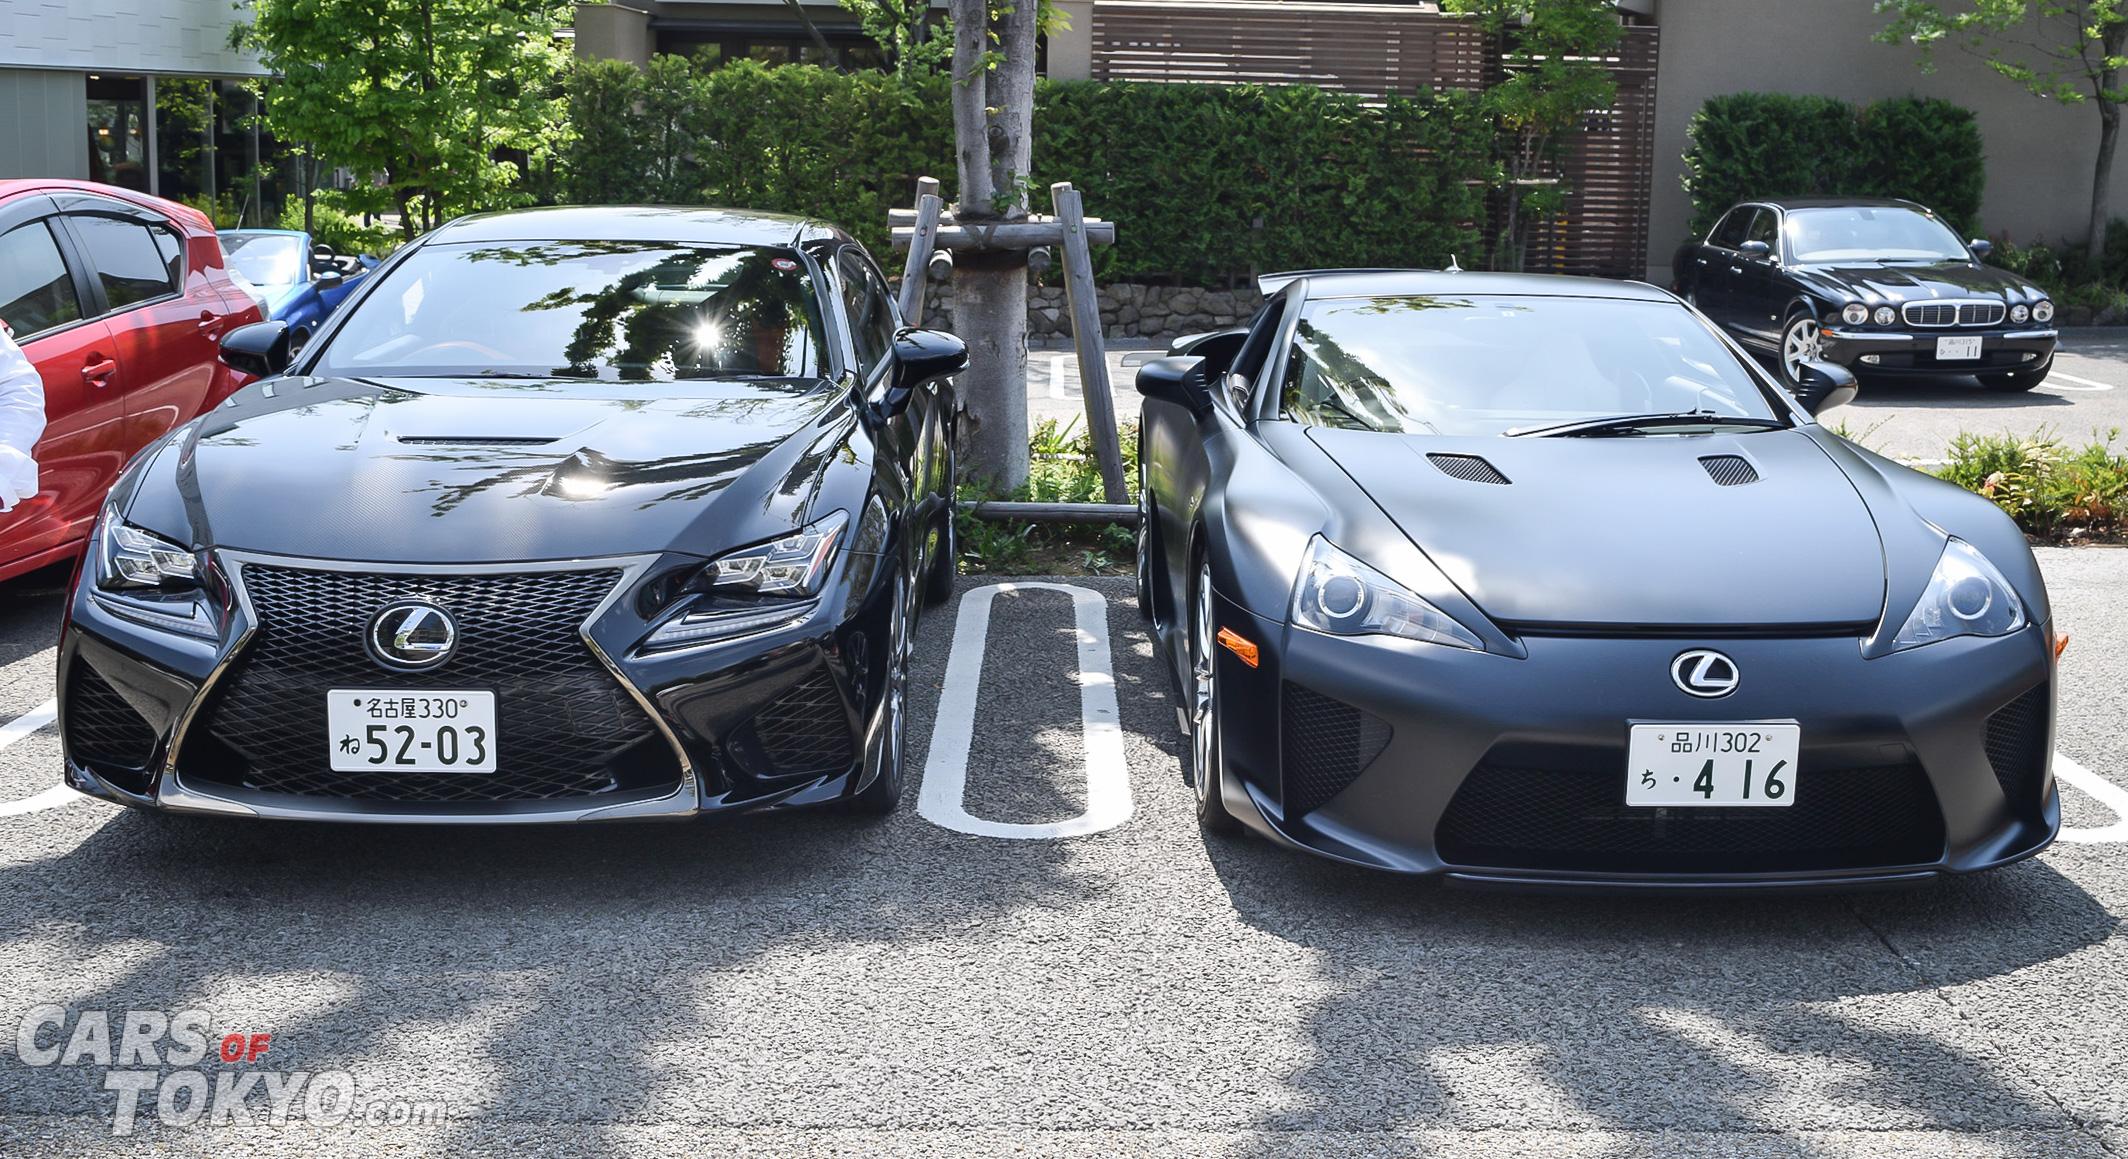 Cars of Tokyo Daikanyama Lexus RC F & LFA